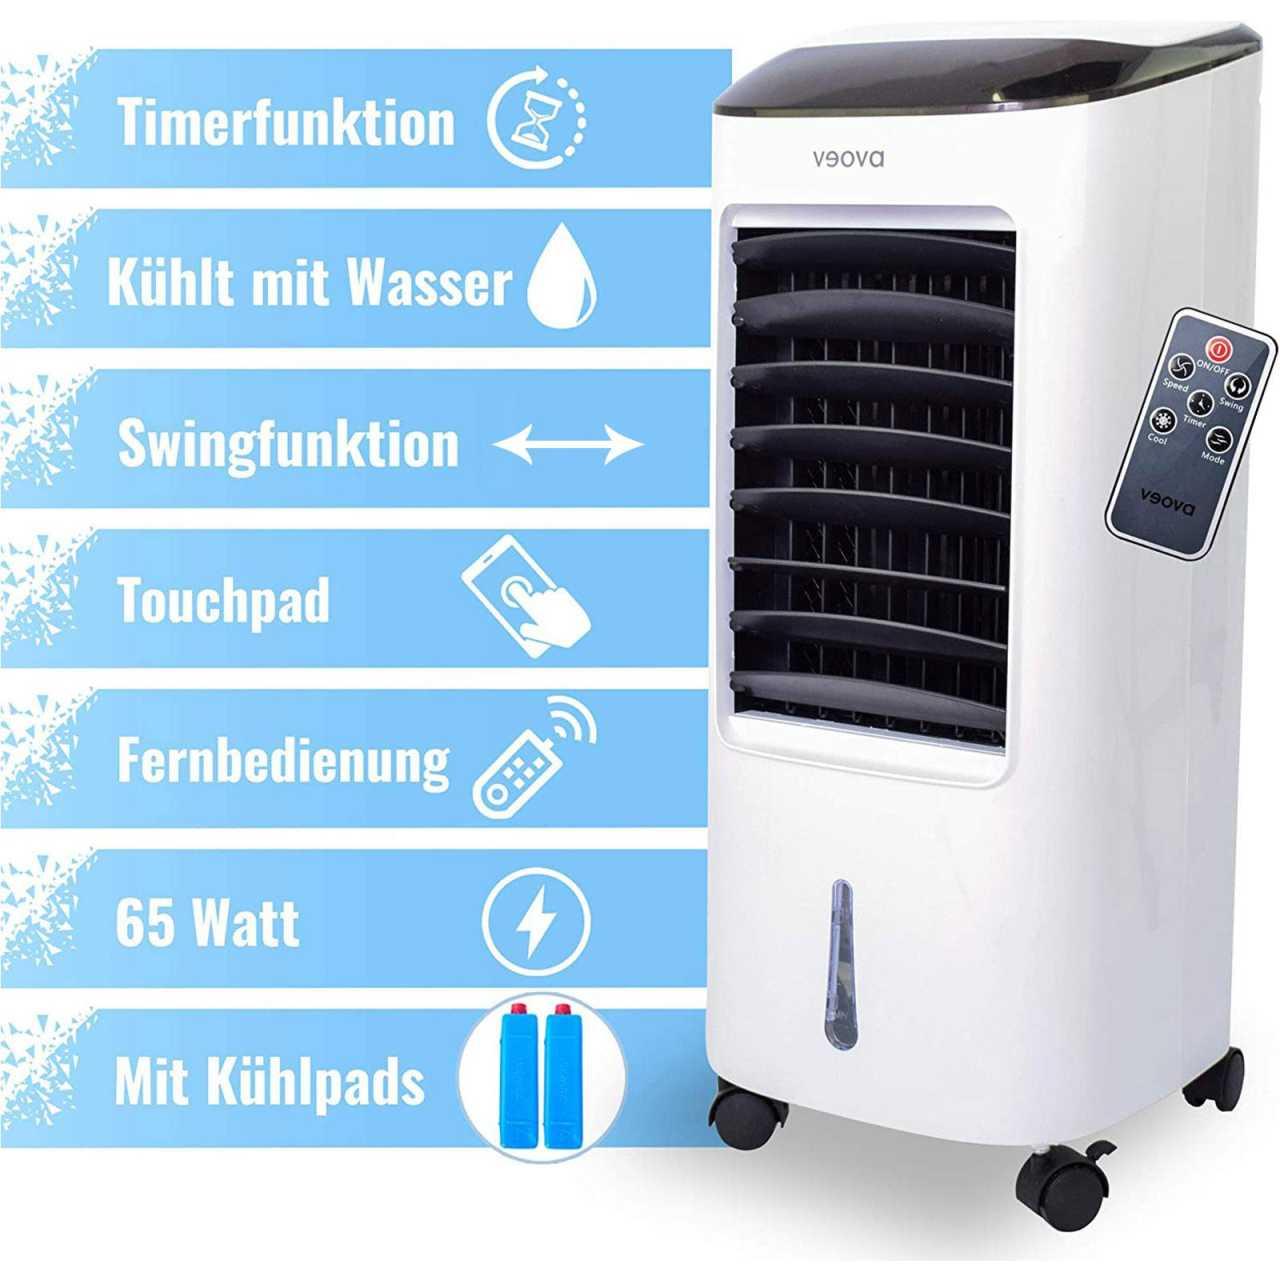 Veova Air Cooler Pro 3in1 Mobiles Klimagerät Klimaanlage Klima Ventilator KLIVEO01